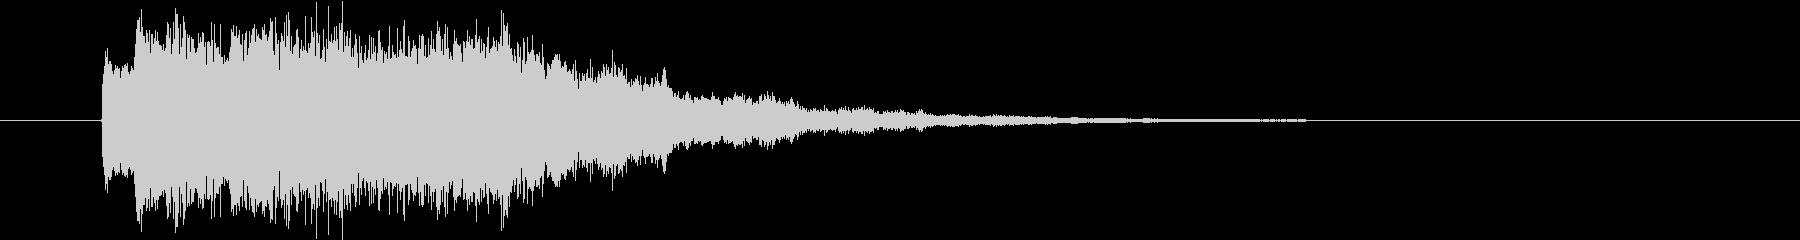 IT系効果音3の未再生の波形